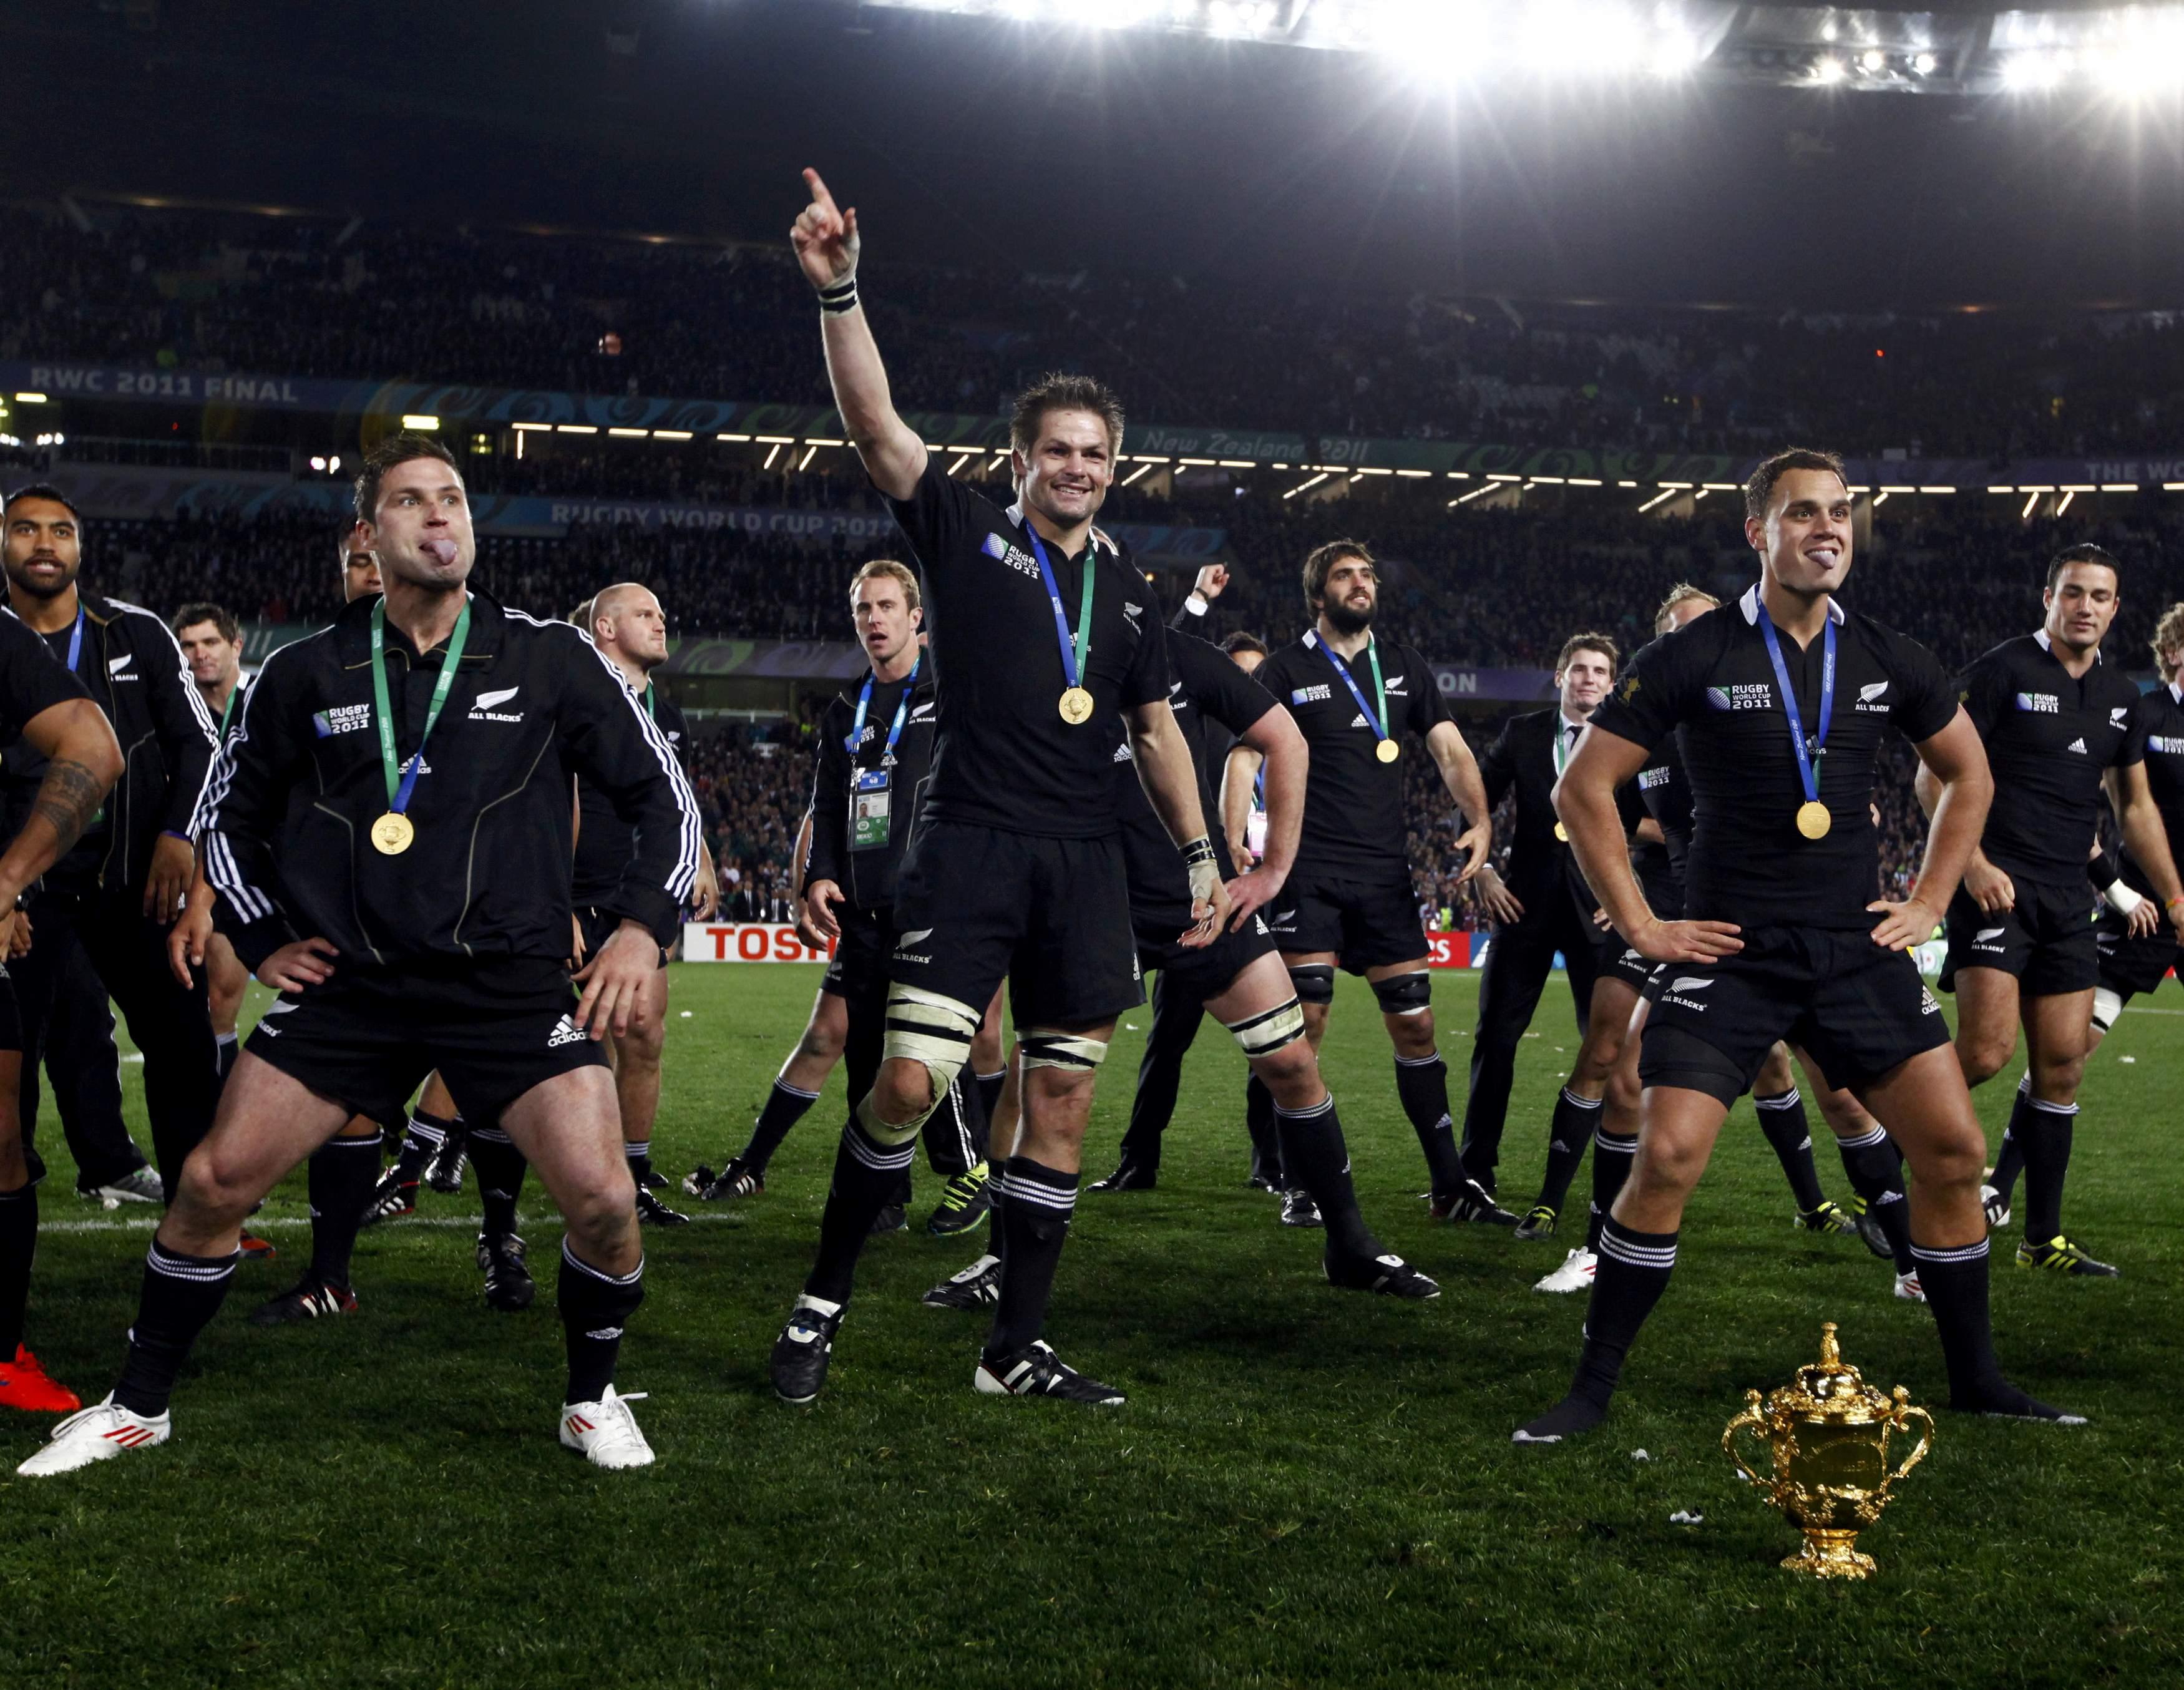 New Zealand All Blacks celebrating a win